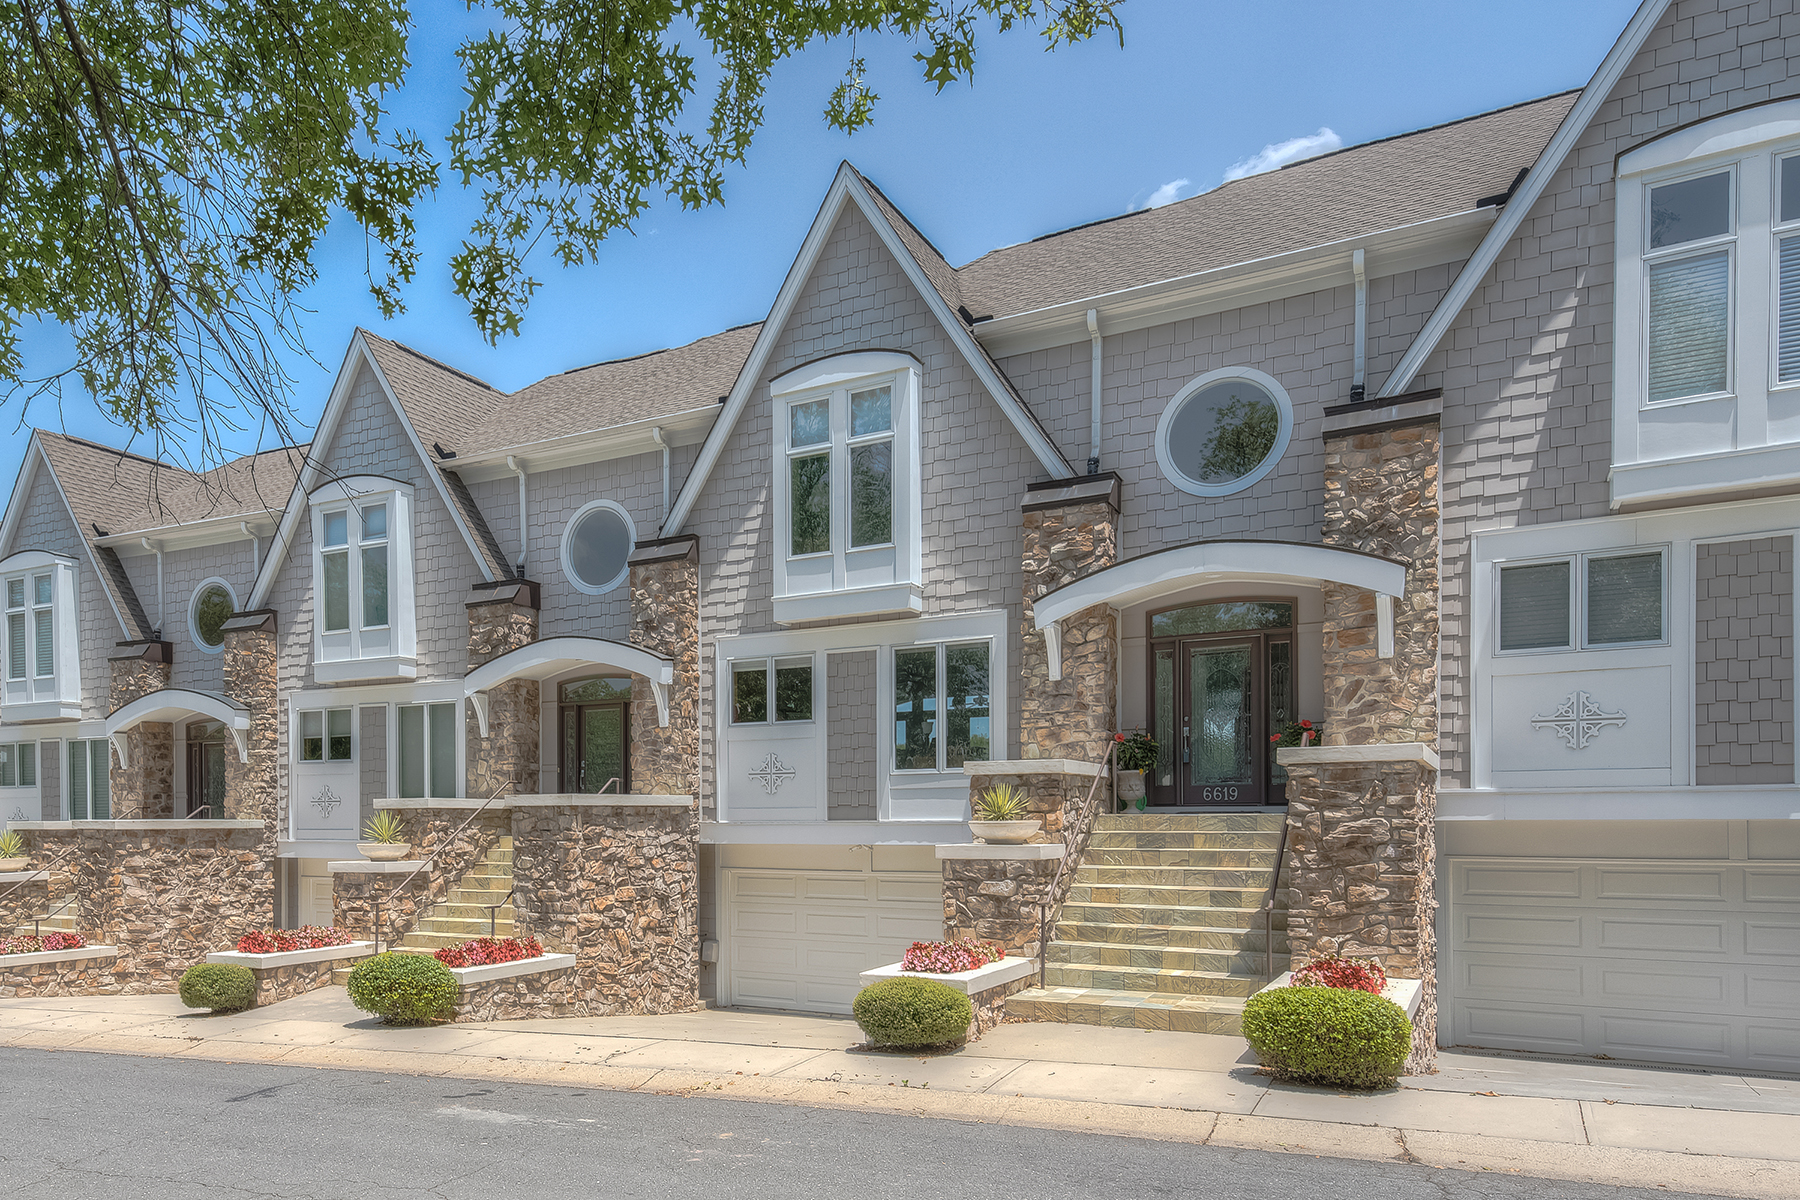 Condominium for Sale at 6701 Kilberry Ln , Charlotte, NC 28277 6701 Kilberry Ln 9 Charlotte, North Carolina, 28277 United States